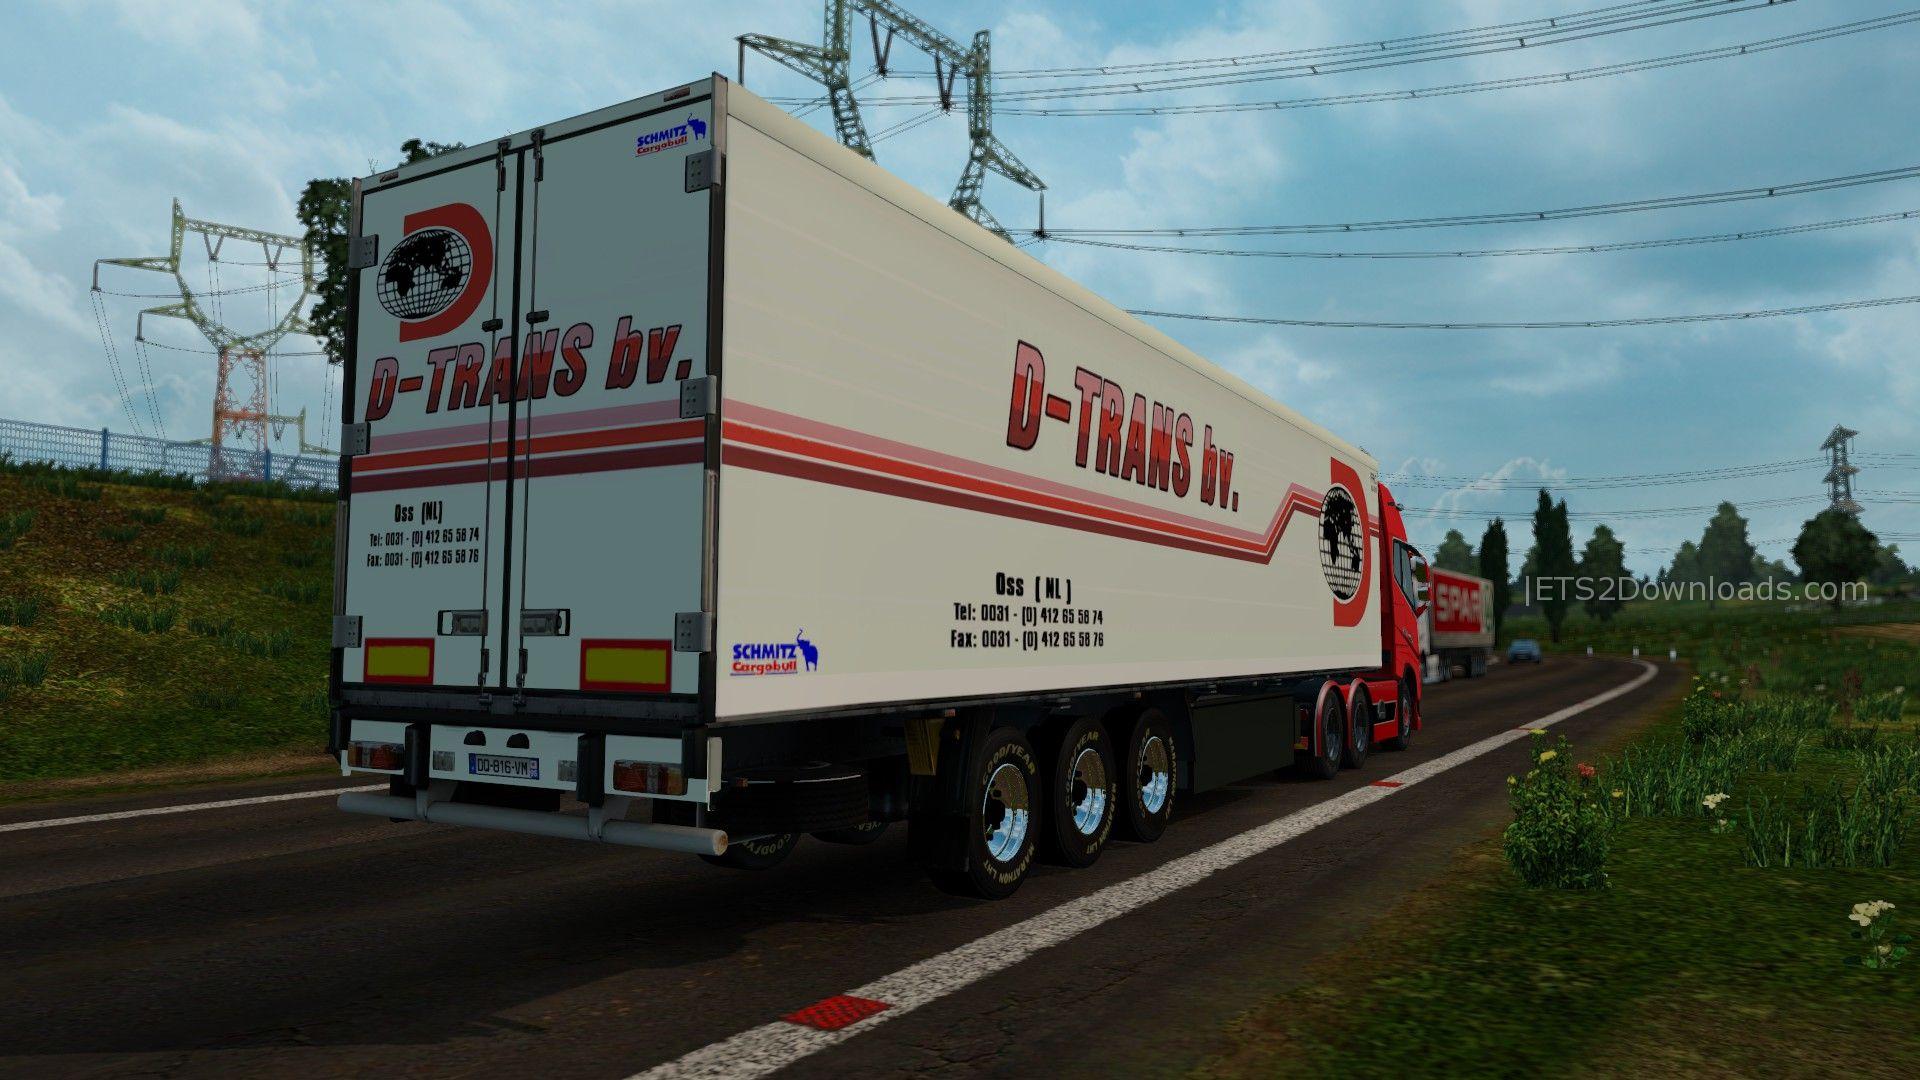 d-trans-bv-trailer